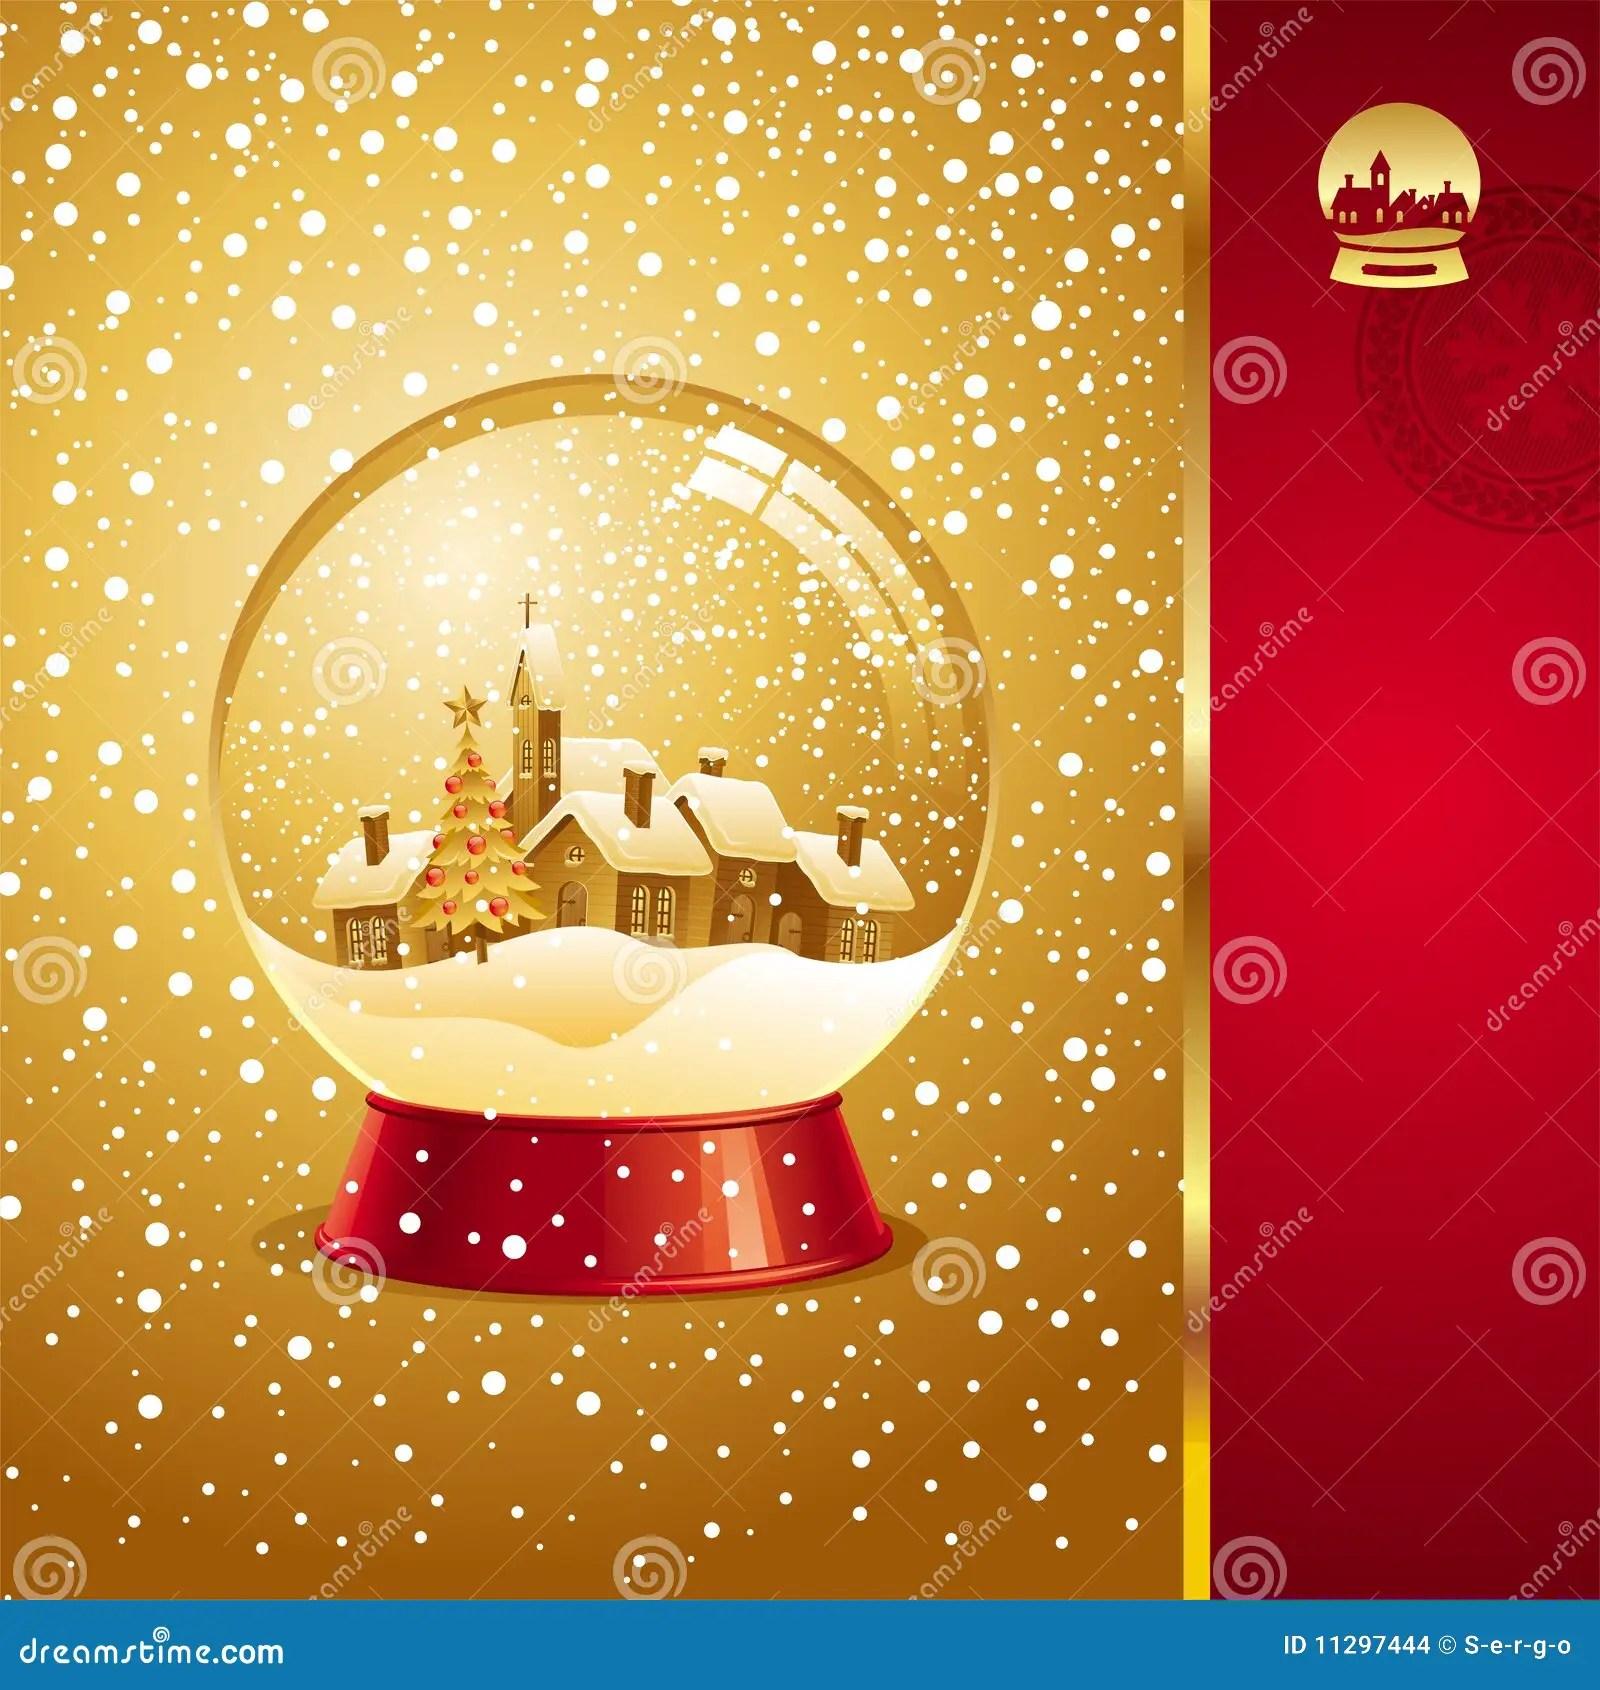 Christmas Card With Snow Globe Stock Vector Illustration